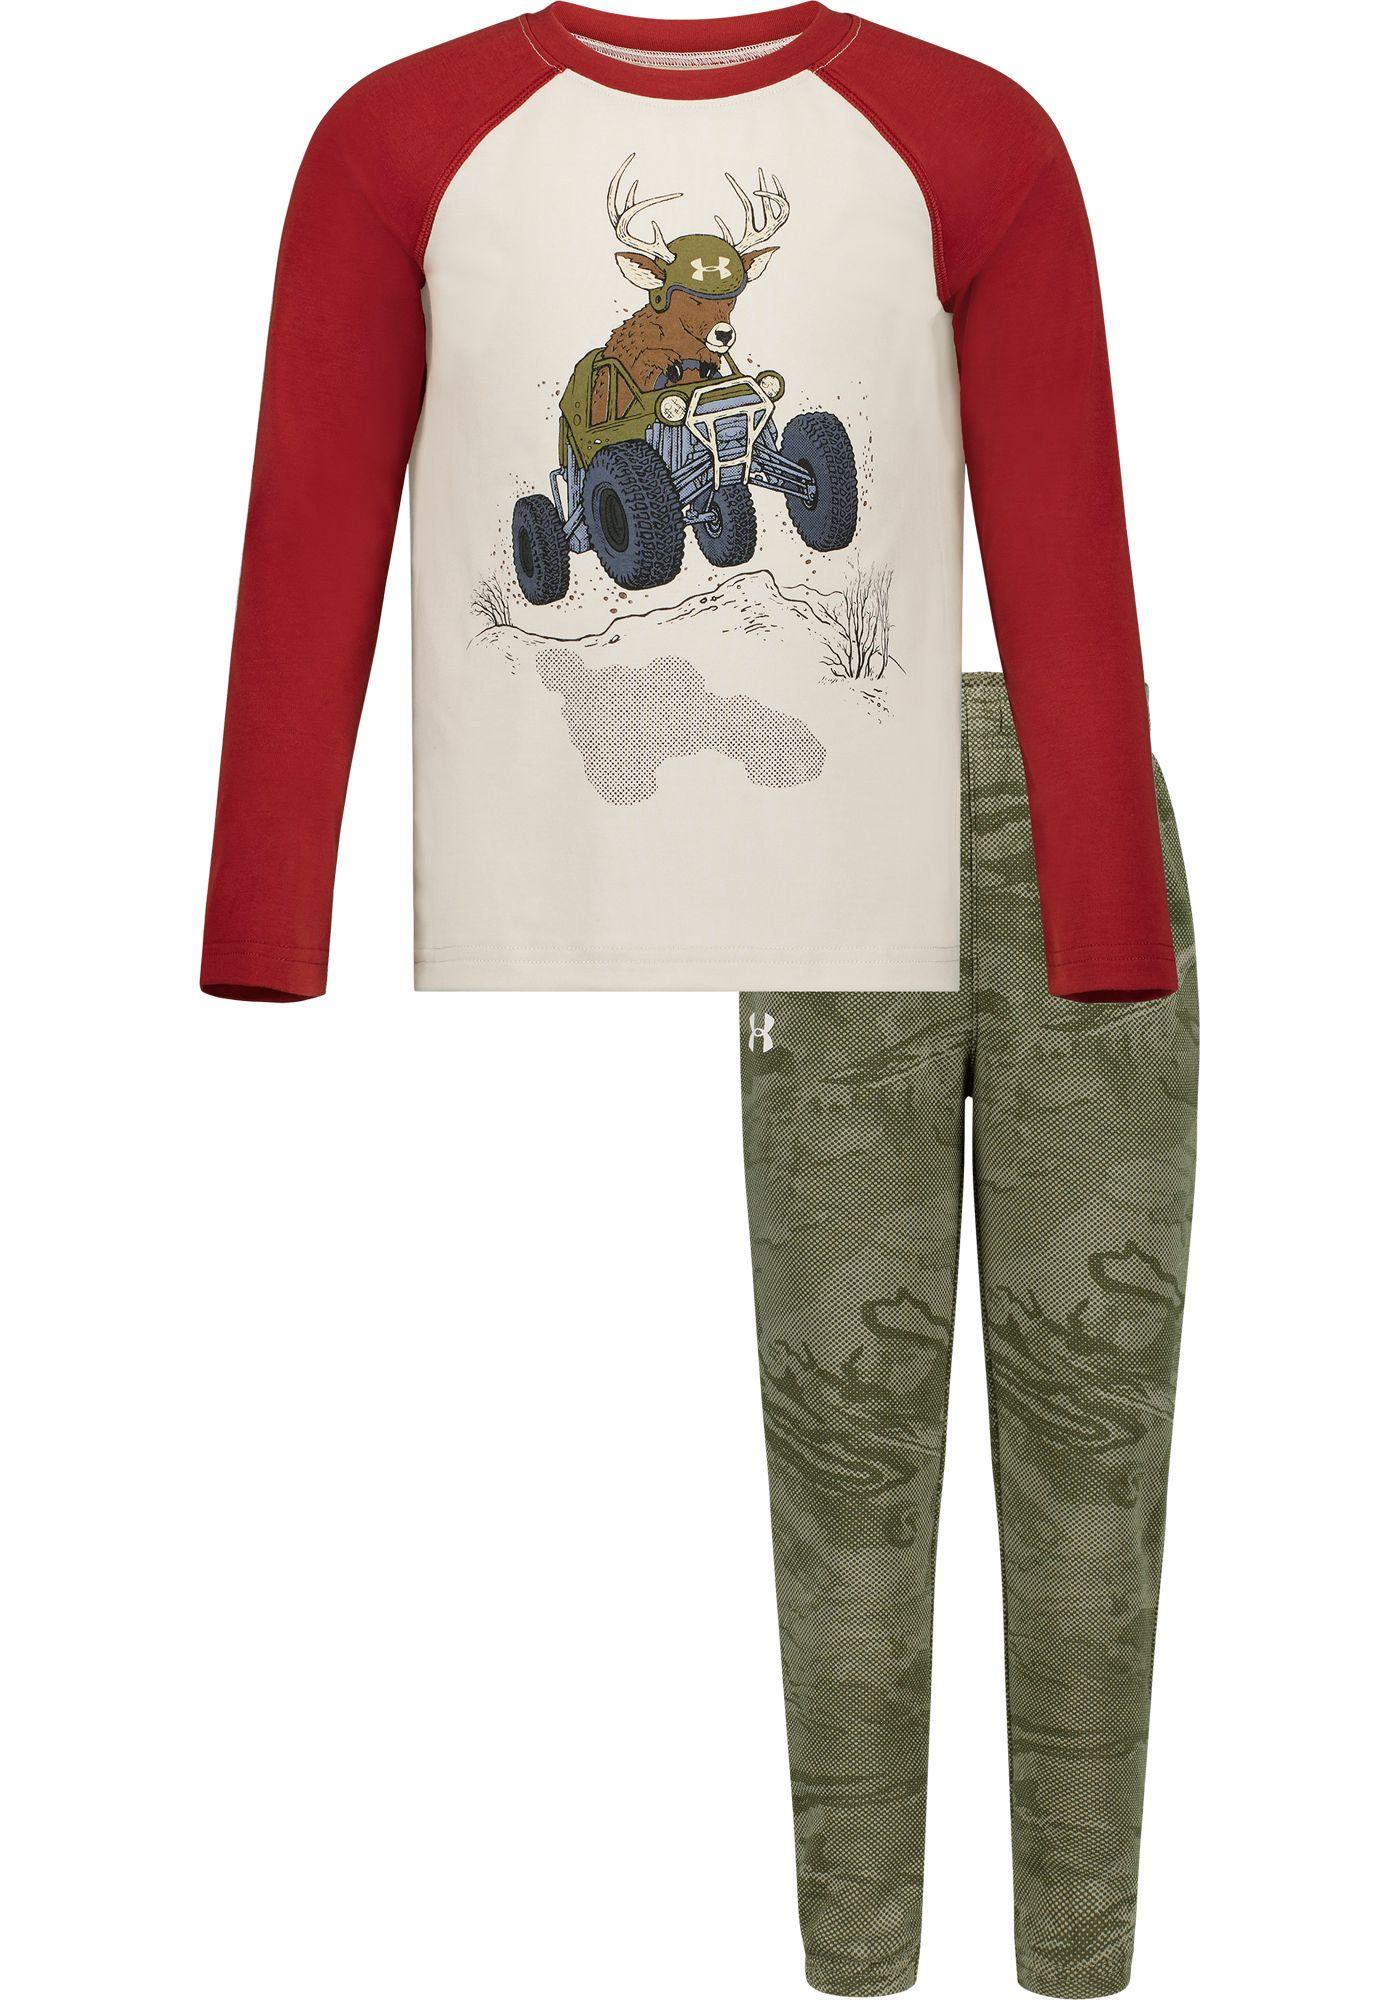 Under Armour Toddler Boys' Deer Buggy T-Shirt and Pants Set